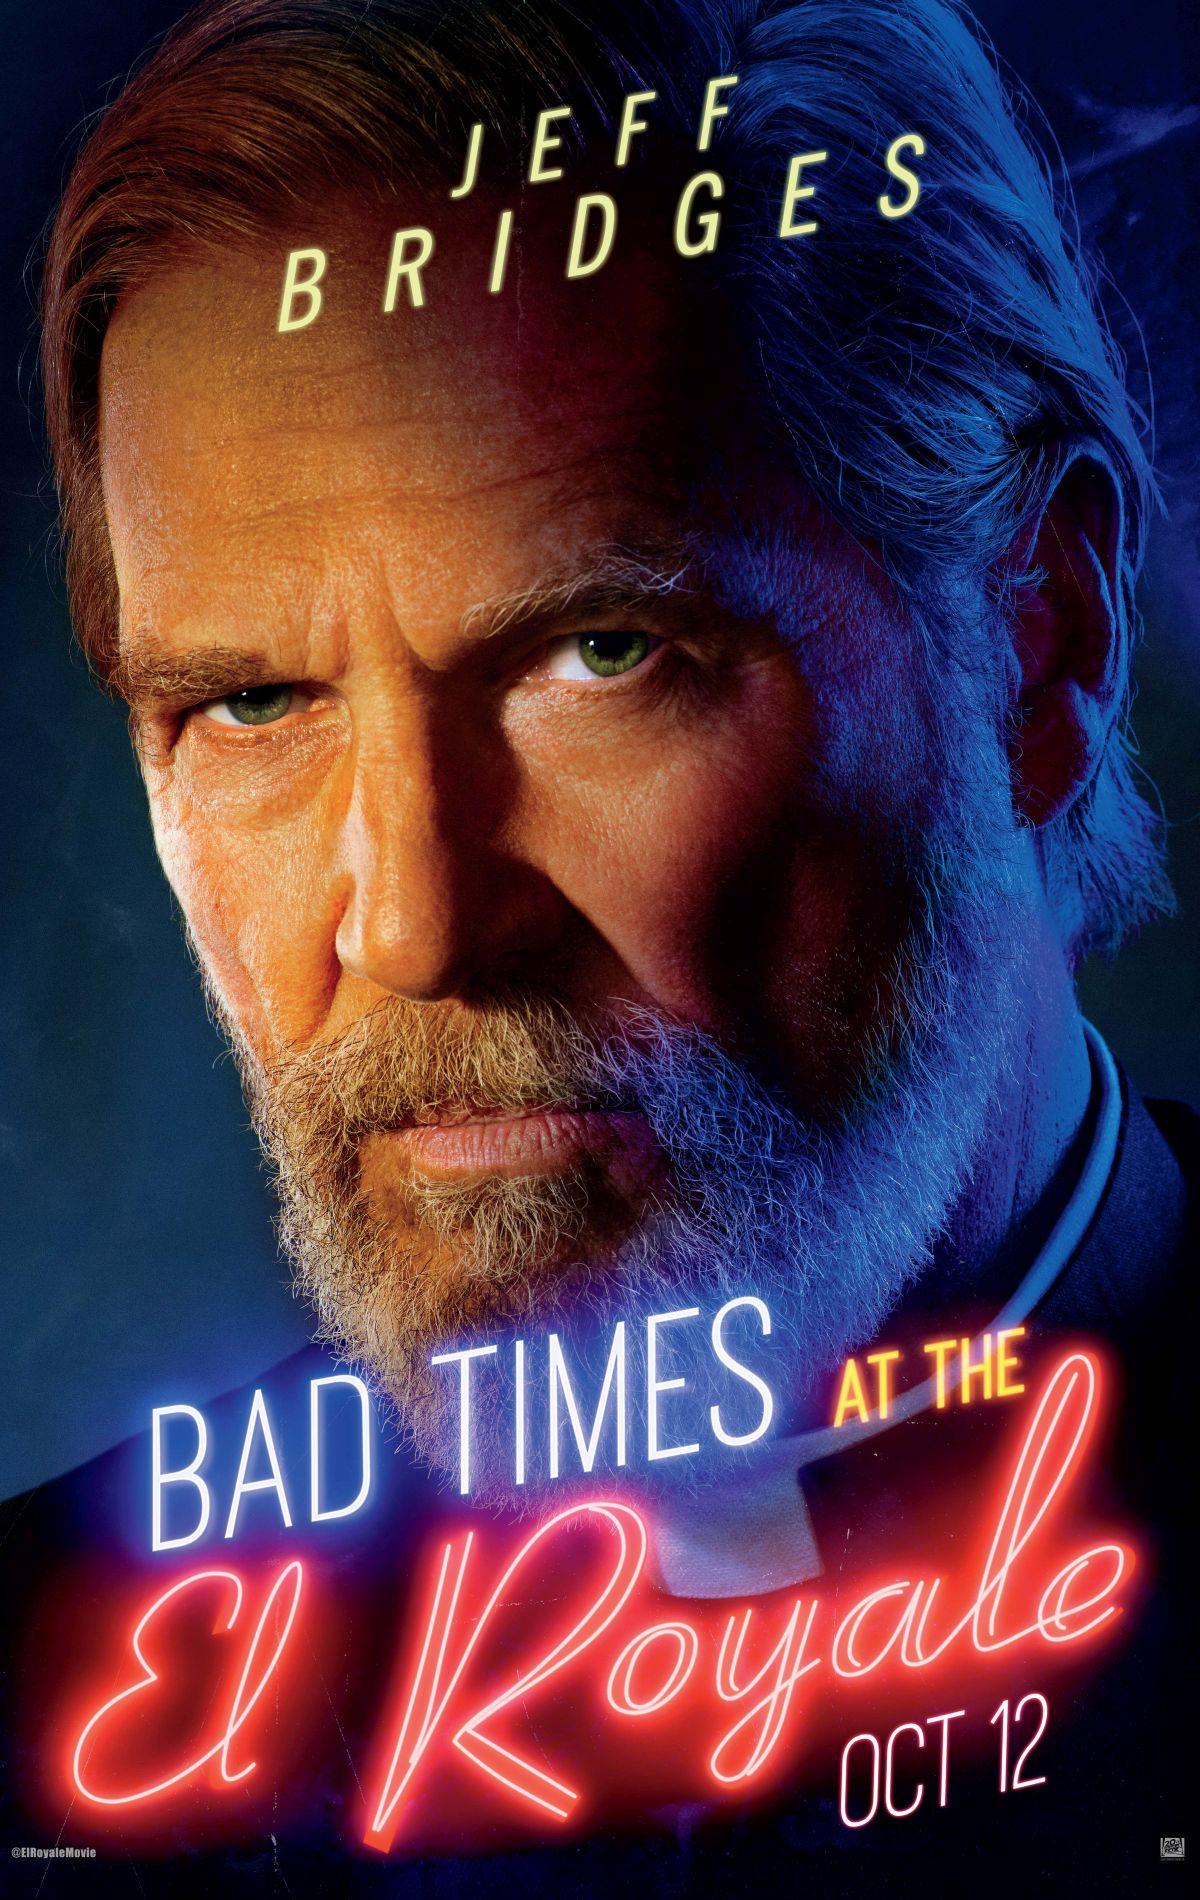 7 Sconosciuti a El Royale: il character poster di Jeff Bridges